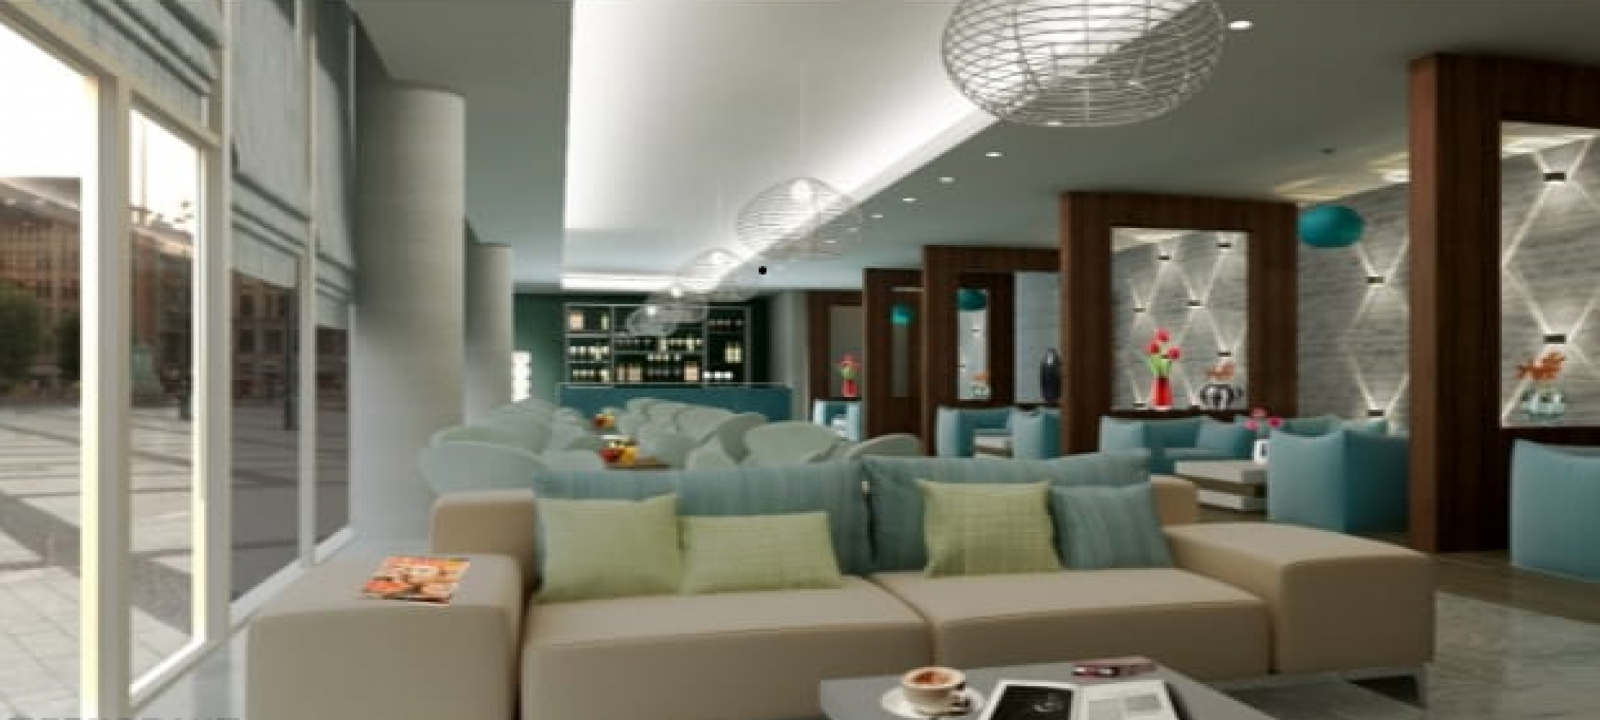 Dubai Marina, UAE, ,International Properties,For Sale,1101